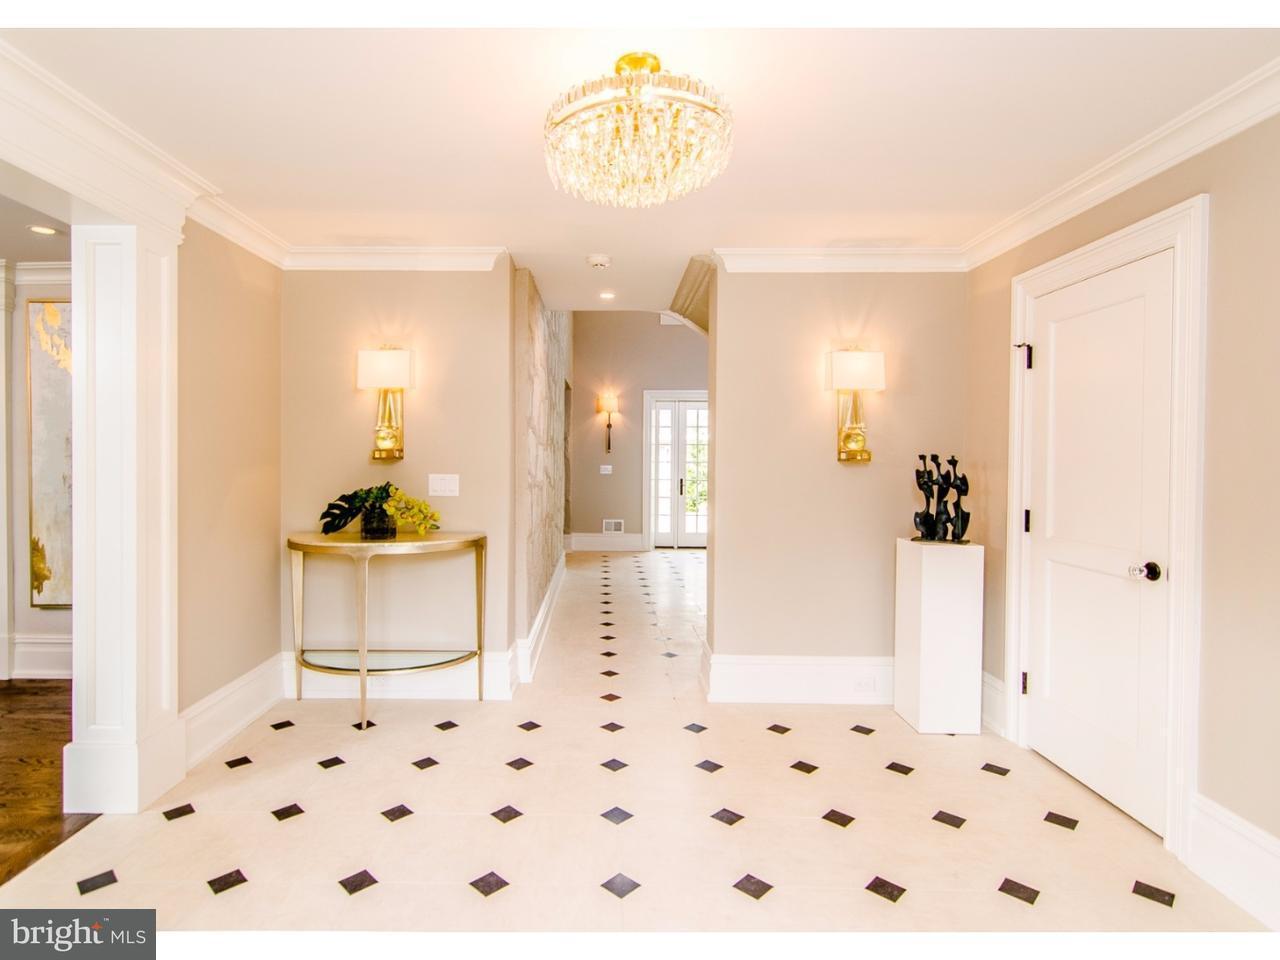 Additional photo for property listing at 75 CLEVELAND Lane  Princeton, Нью-Джерси 08540 Соединенные Штаты